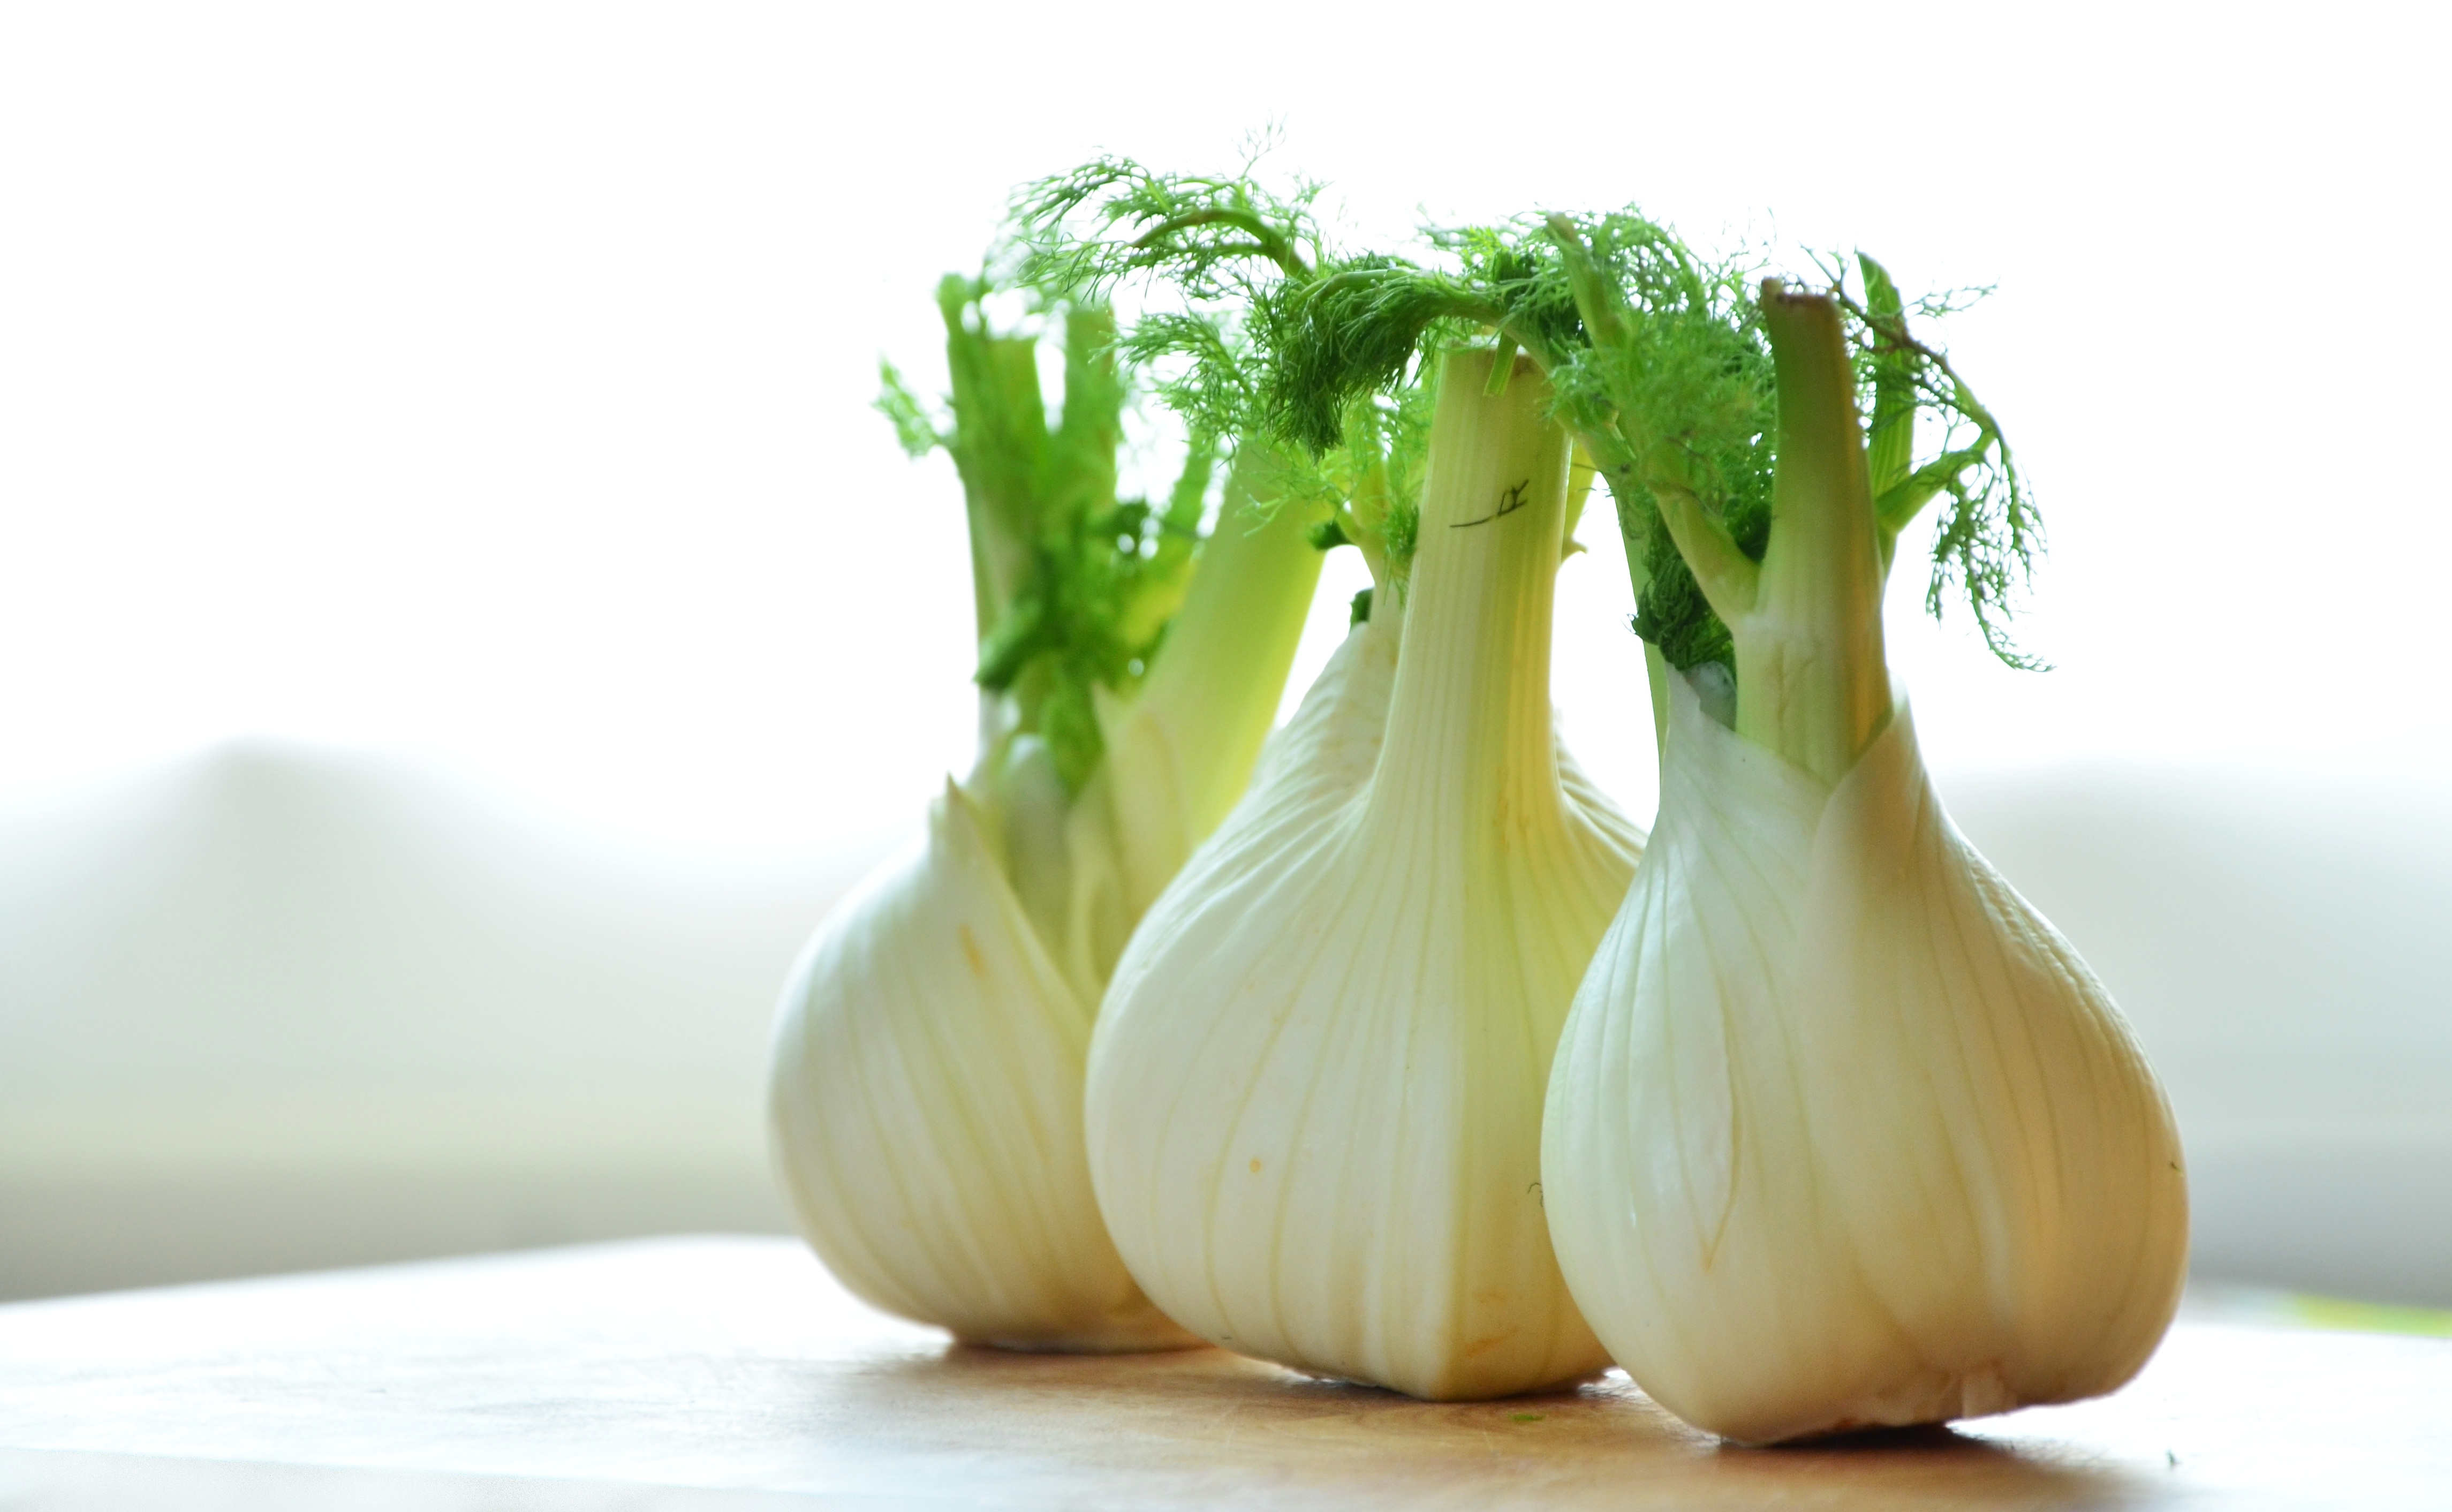 https://images.pexels.com/photos/159471/fennel-vegetables-fennel-bulb-food-159471.jpeg